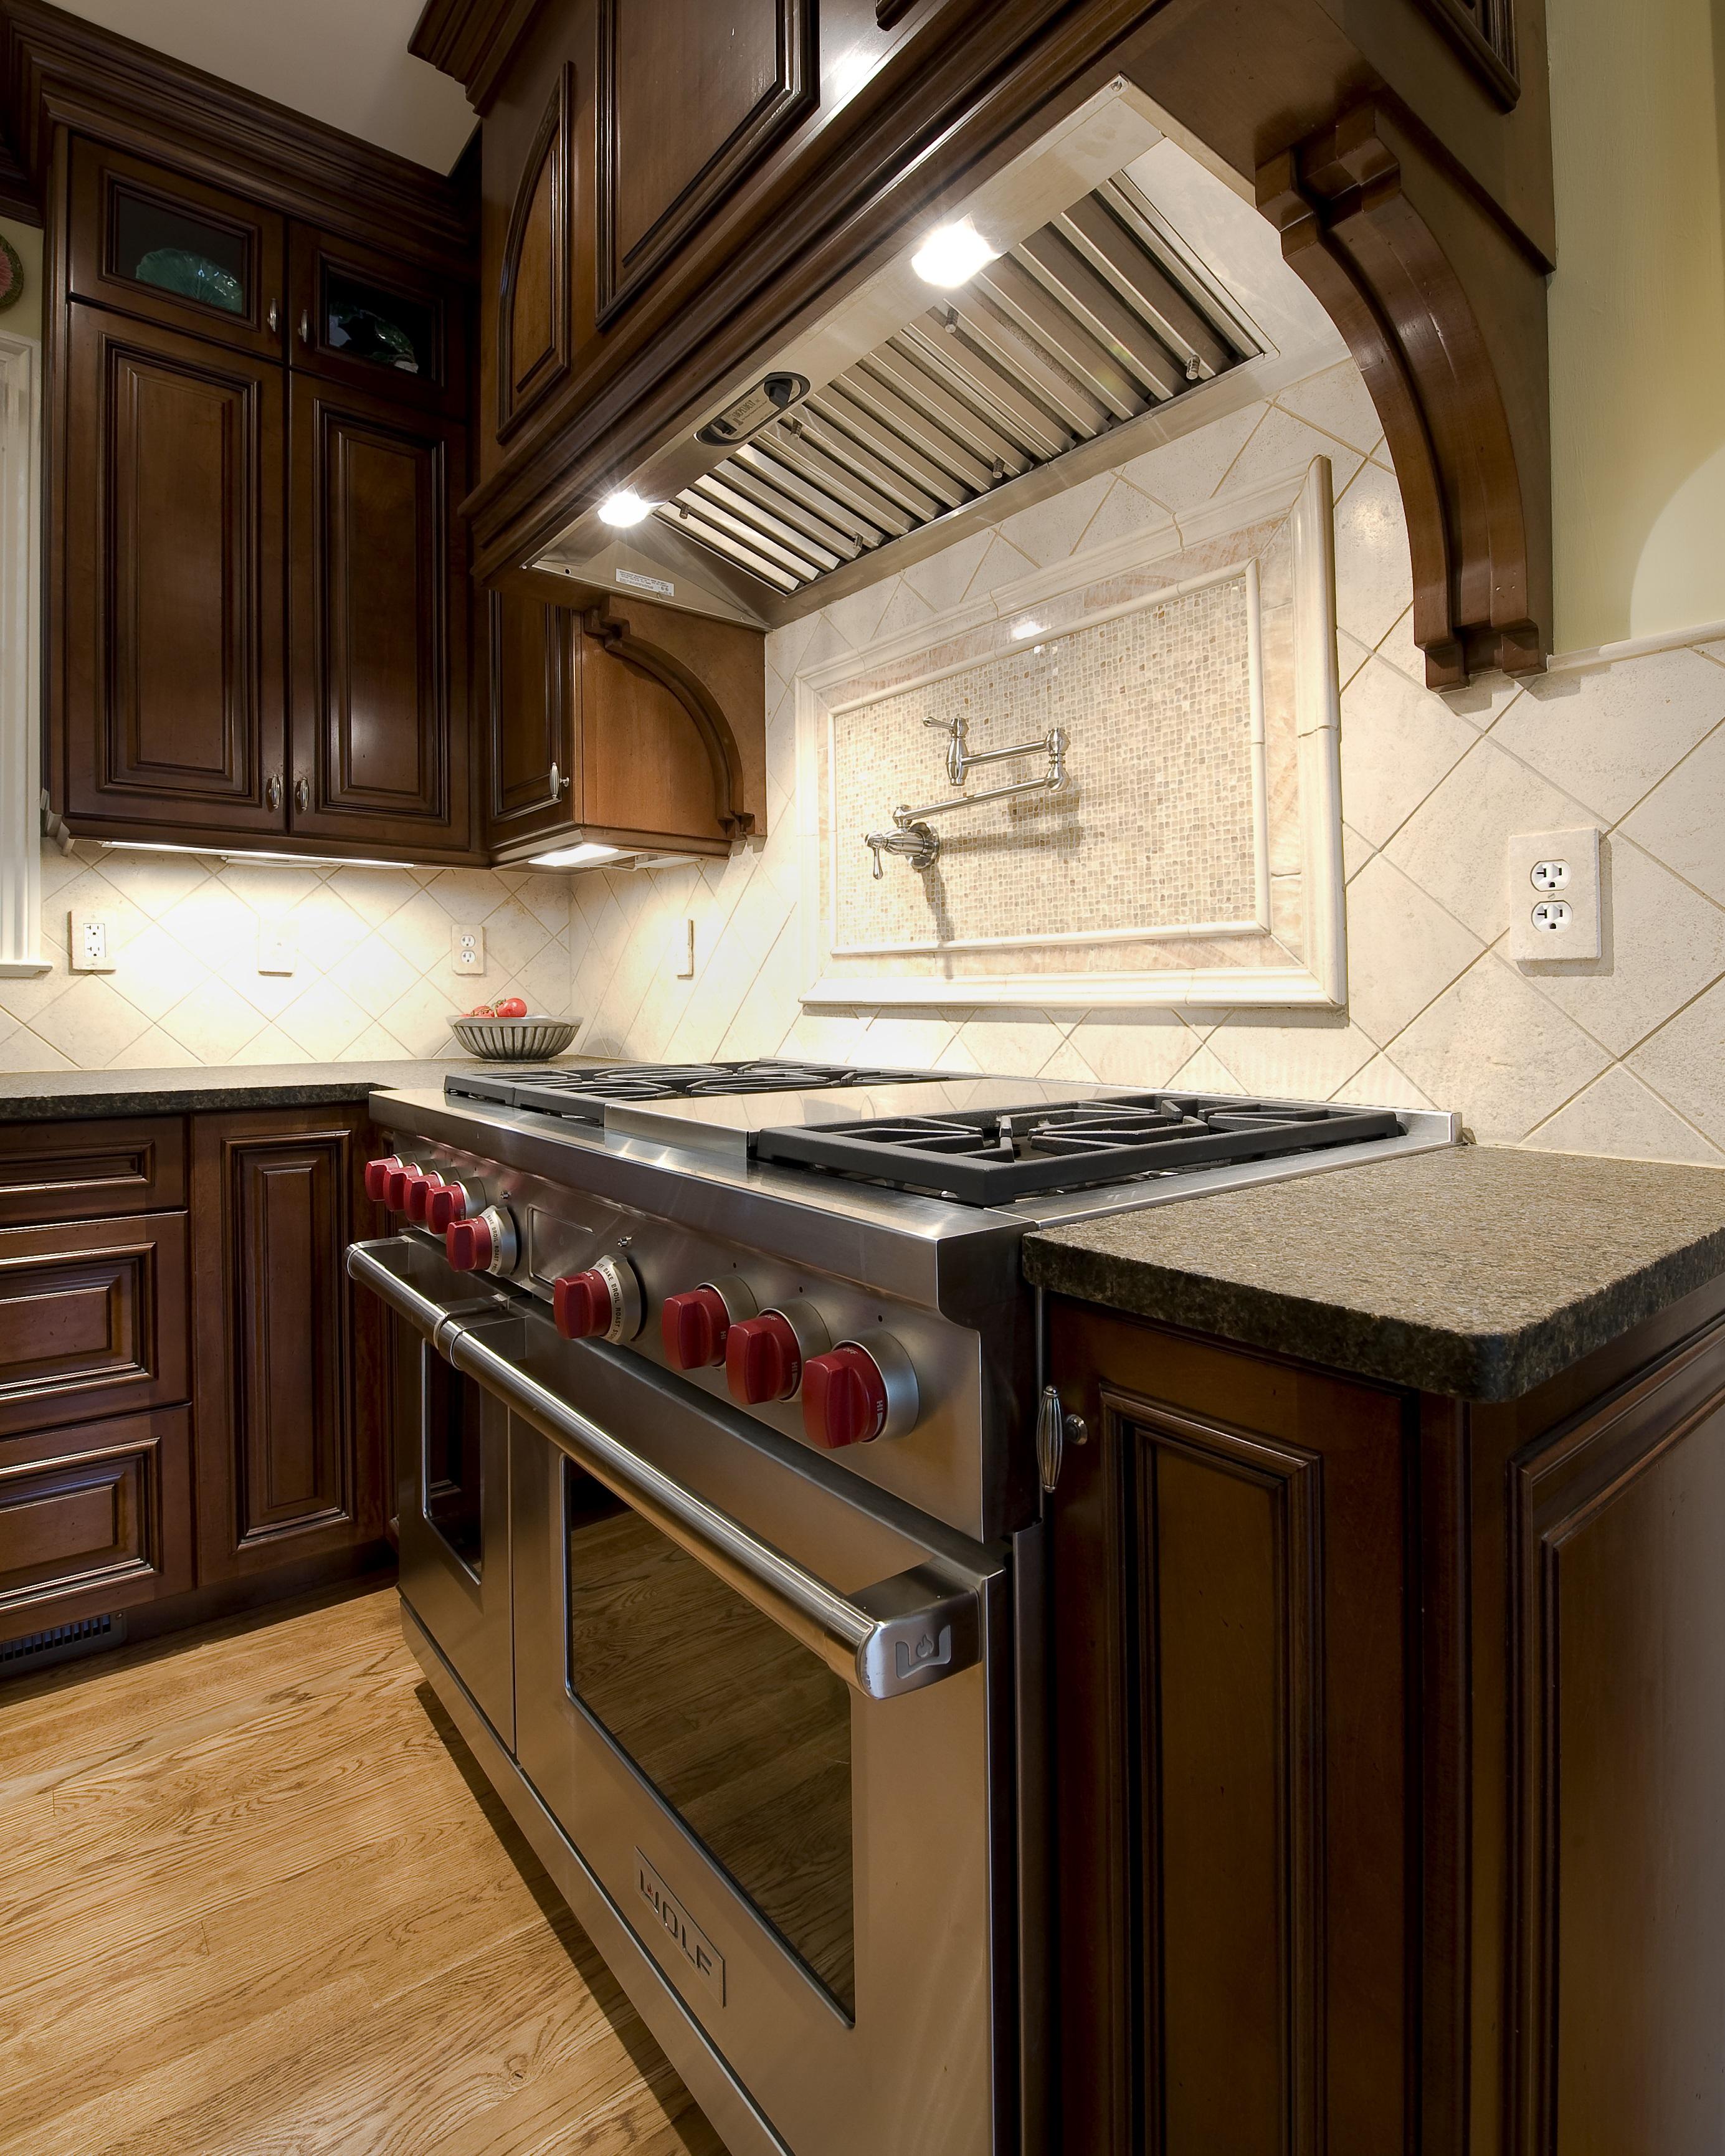 kitchen backsplashes completing kitchen interior design kitchen backsplashes belle maison short hills